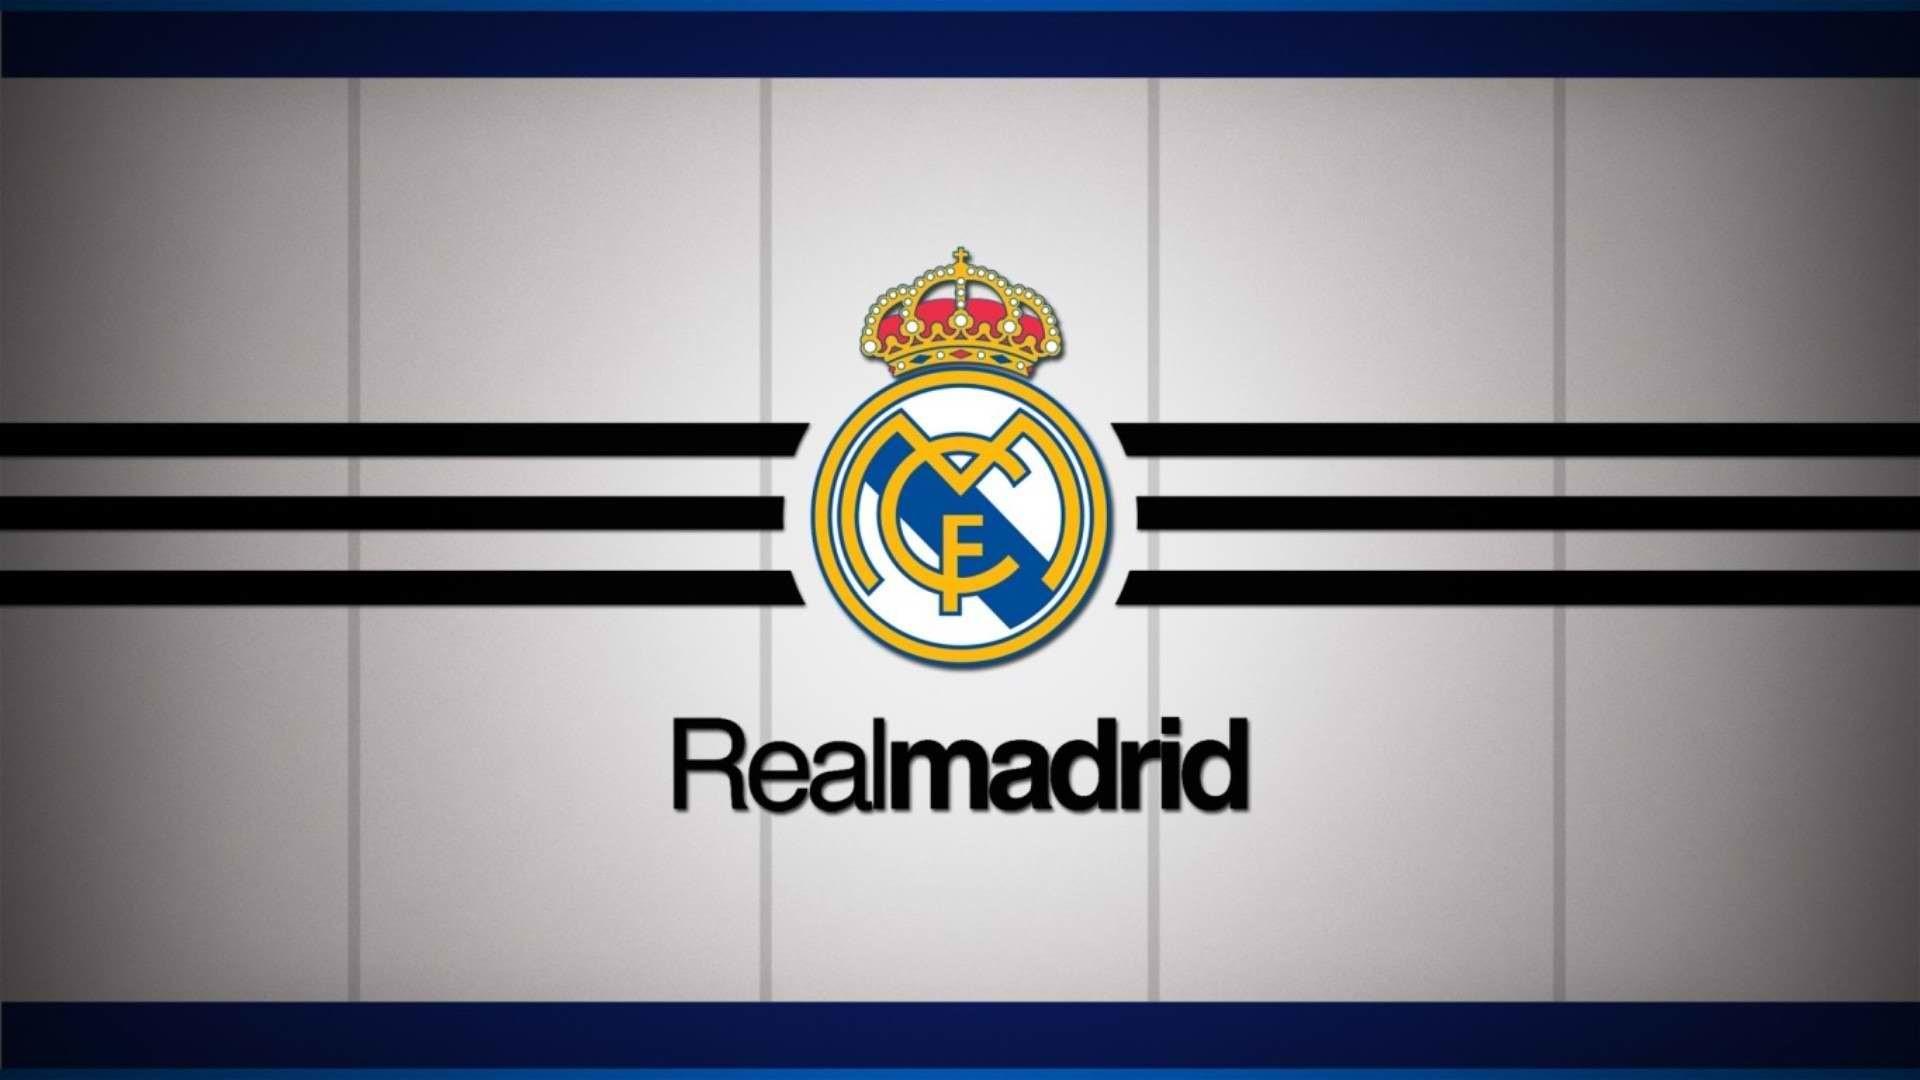 Real Madrid Cf Logo Wallpaper   Real Madrid 2015 Logo Hd 1920x1080